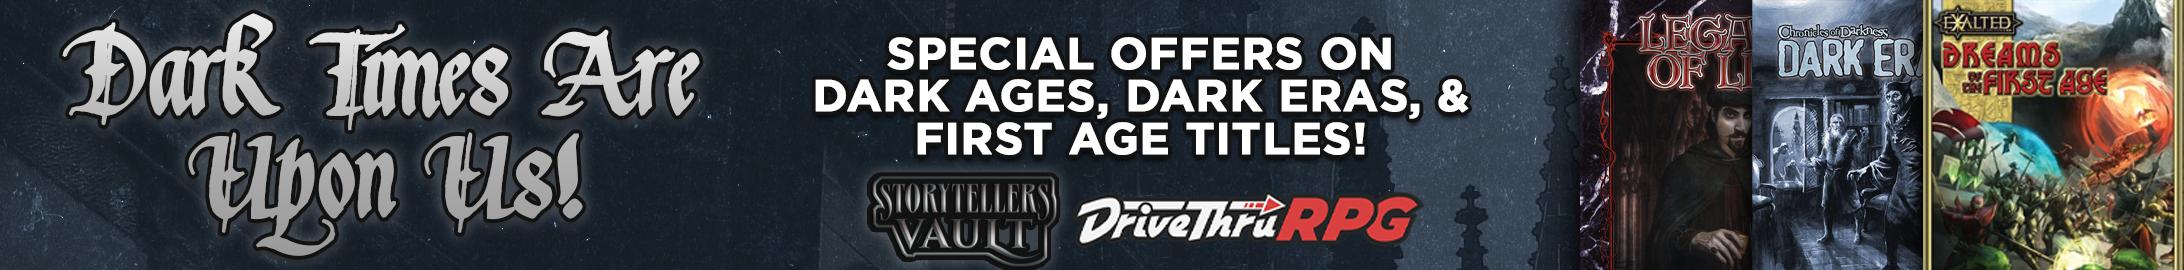 Special offers on Dark Ages, Dark Eras, & First Age titles @ Storytellers Vault